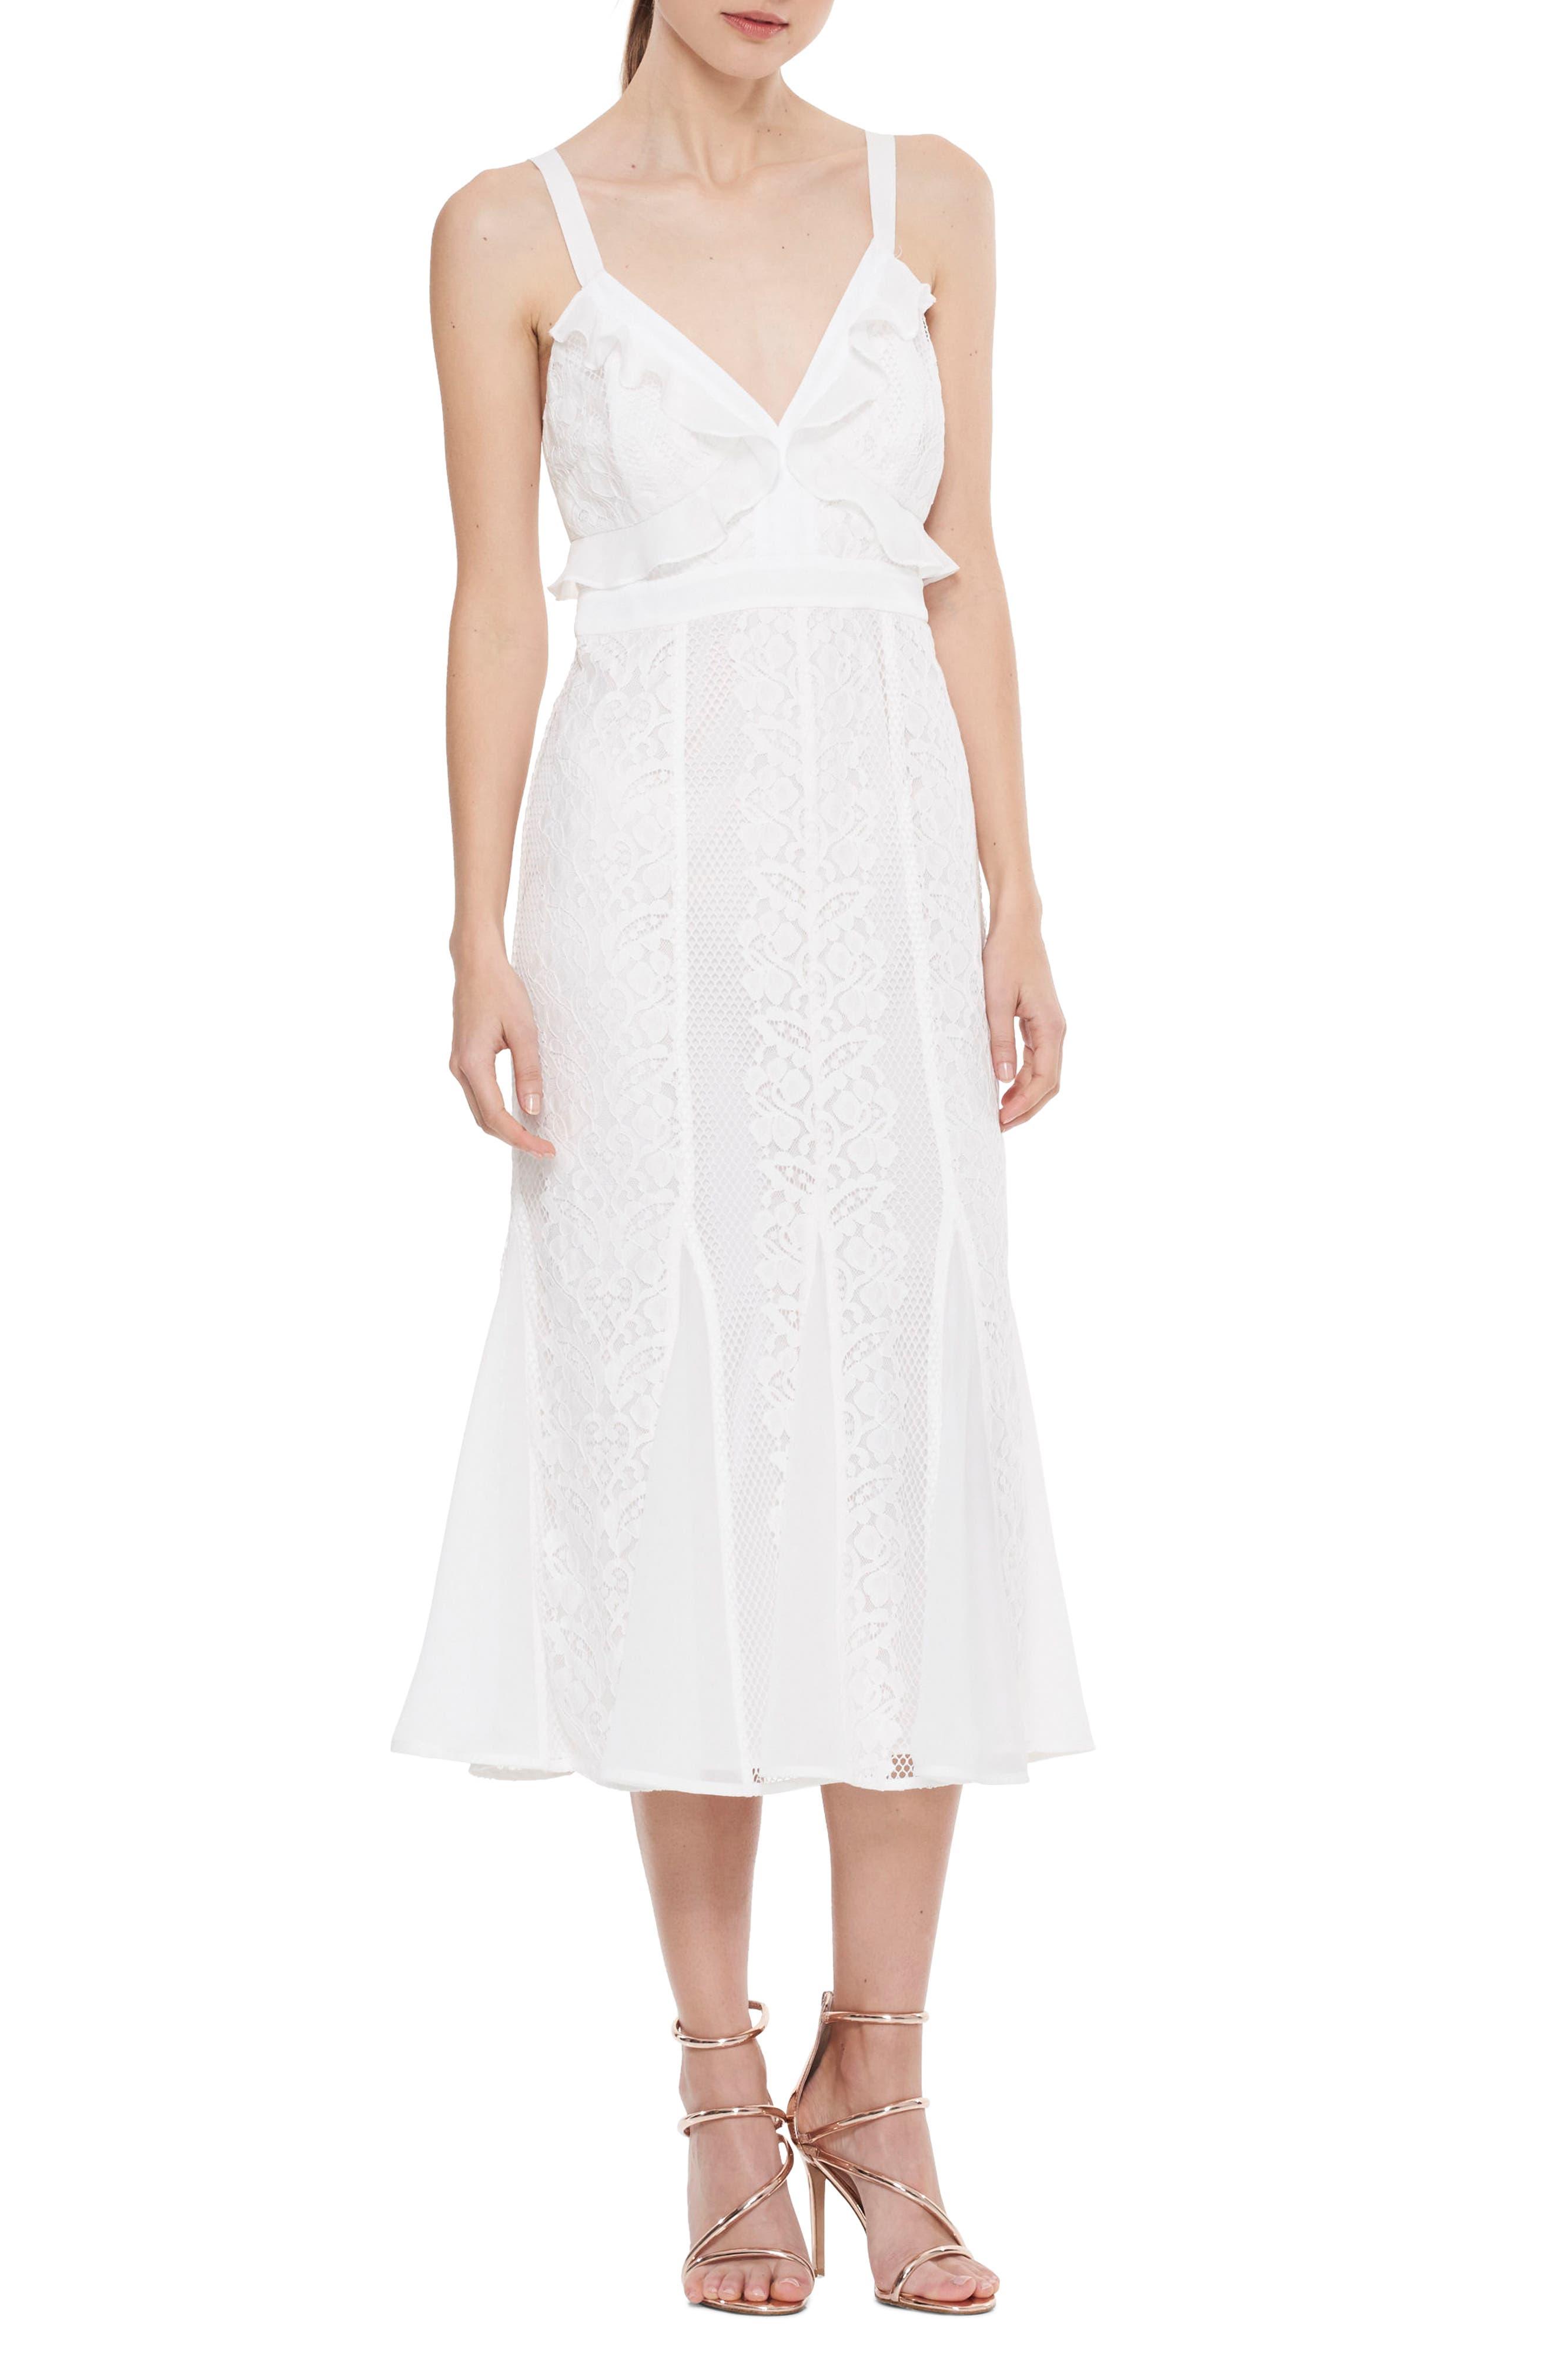 Adoring Ruffle Lace Midi Dress,                         Main,                         color, White